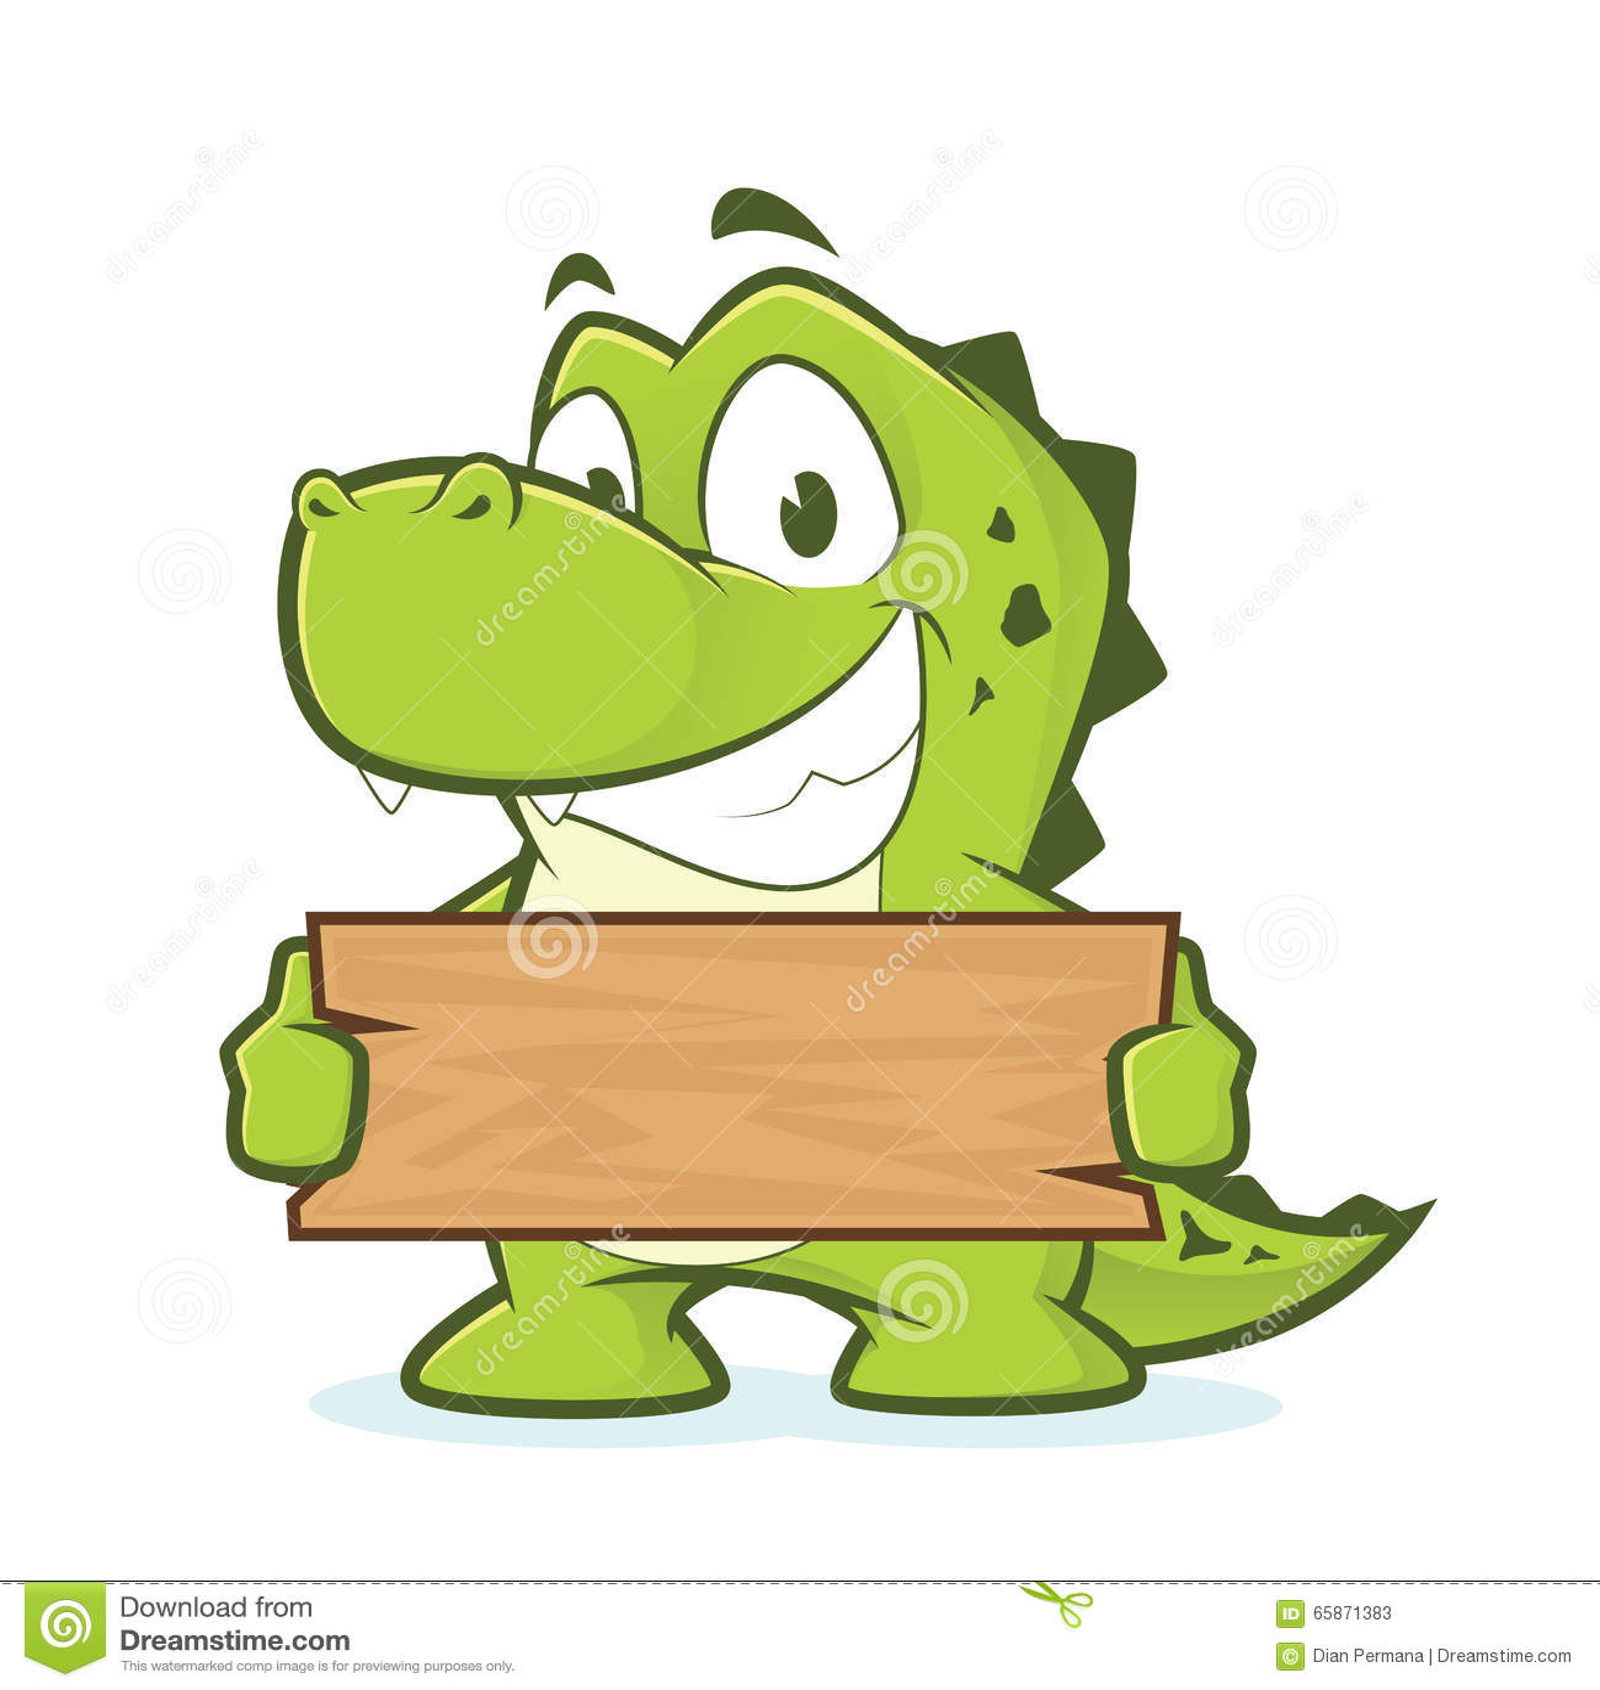 Crocodile or alligator holding a plank of wood stock vector illustration of happy green 65871383 - Crocodile dessin ...